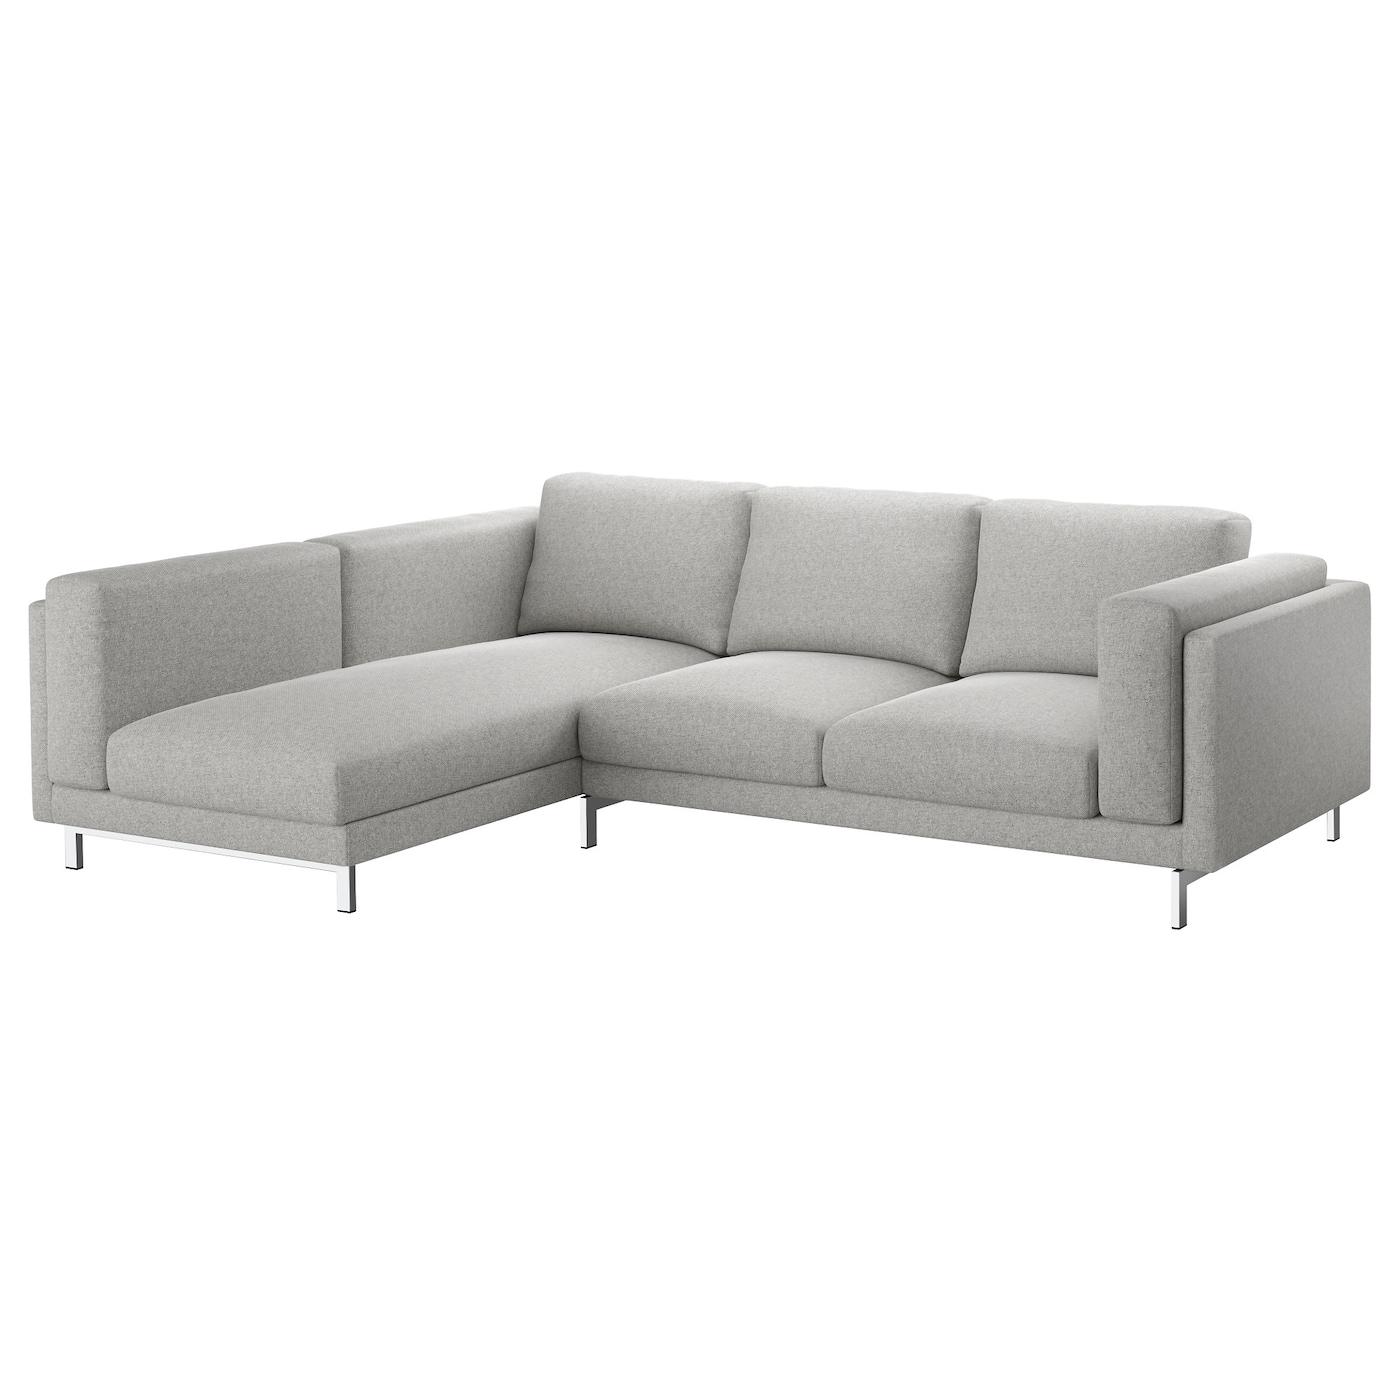 Nockeby 3 Seat Sofa Lejde Dark Grey